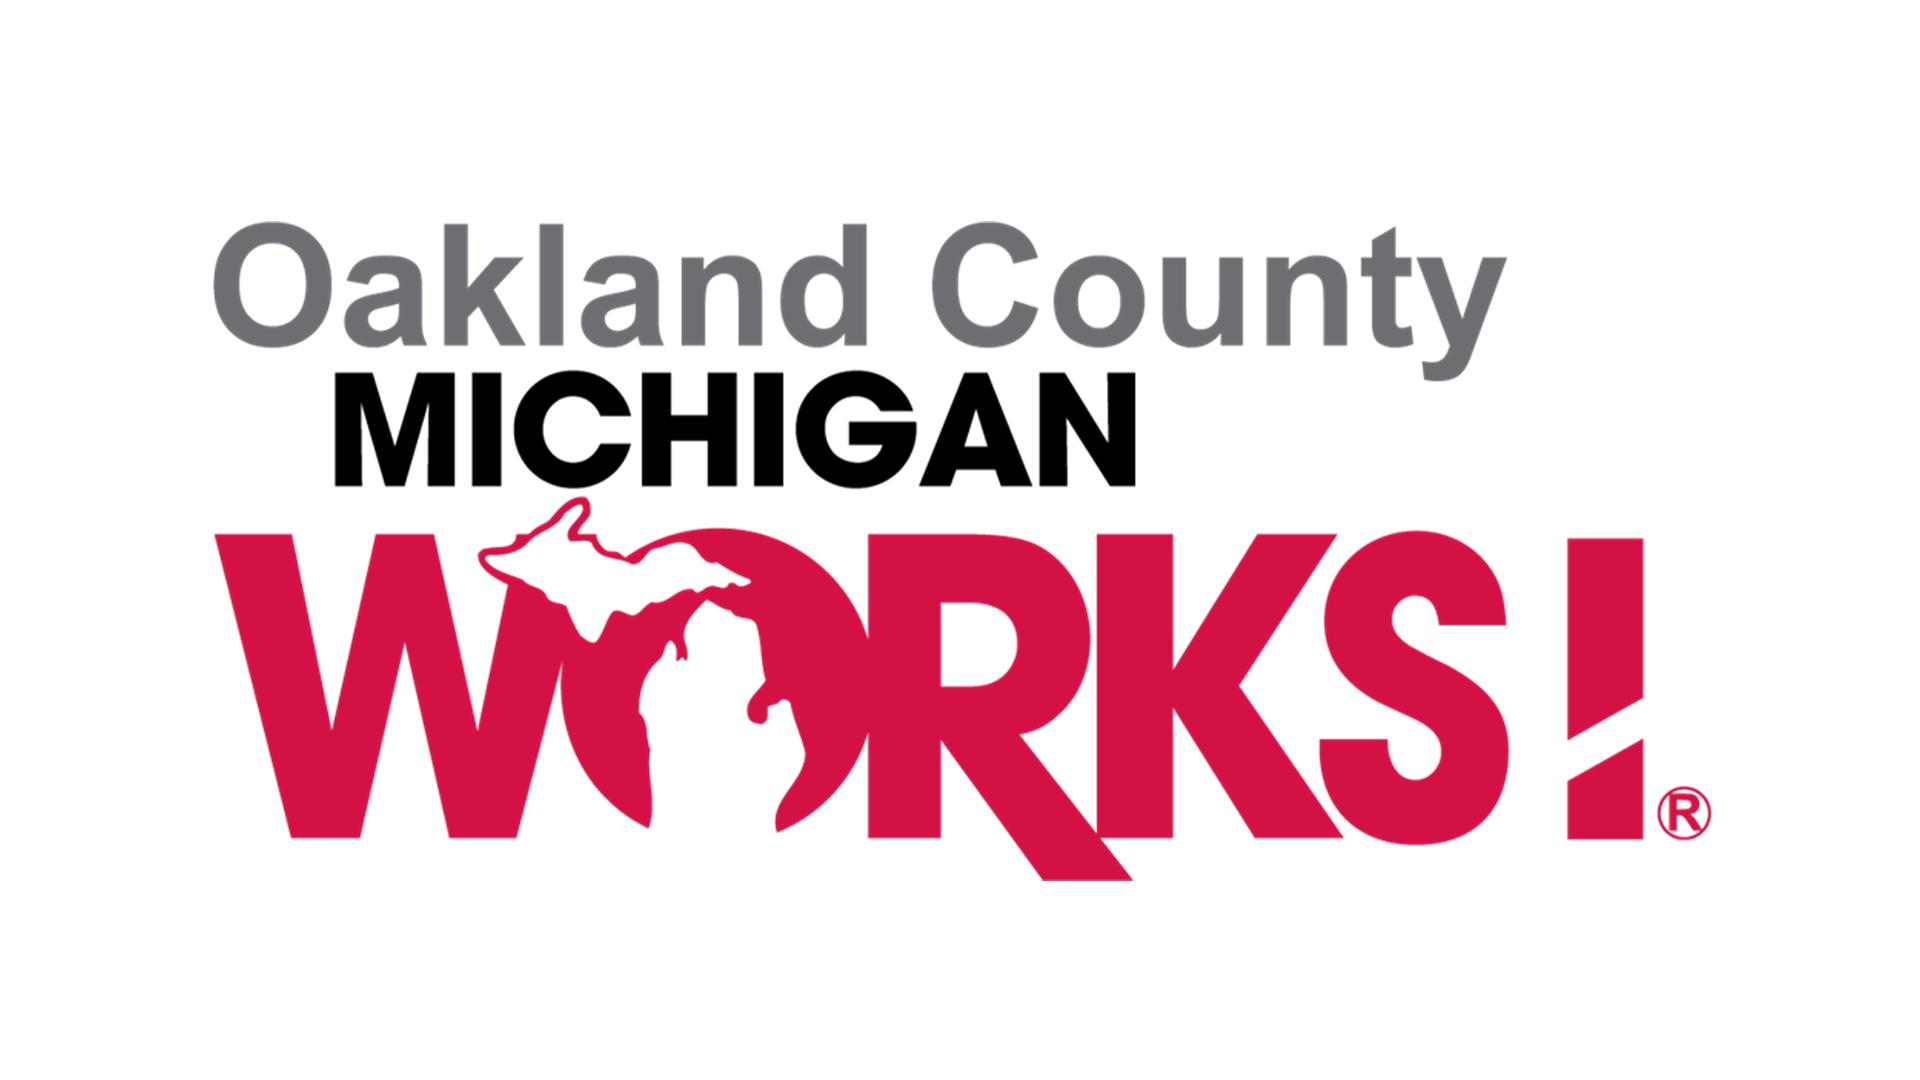 Oakland County Michigan Works!